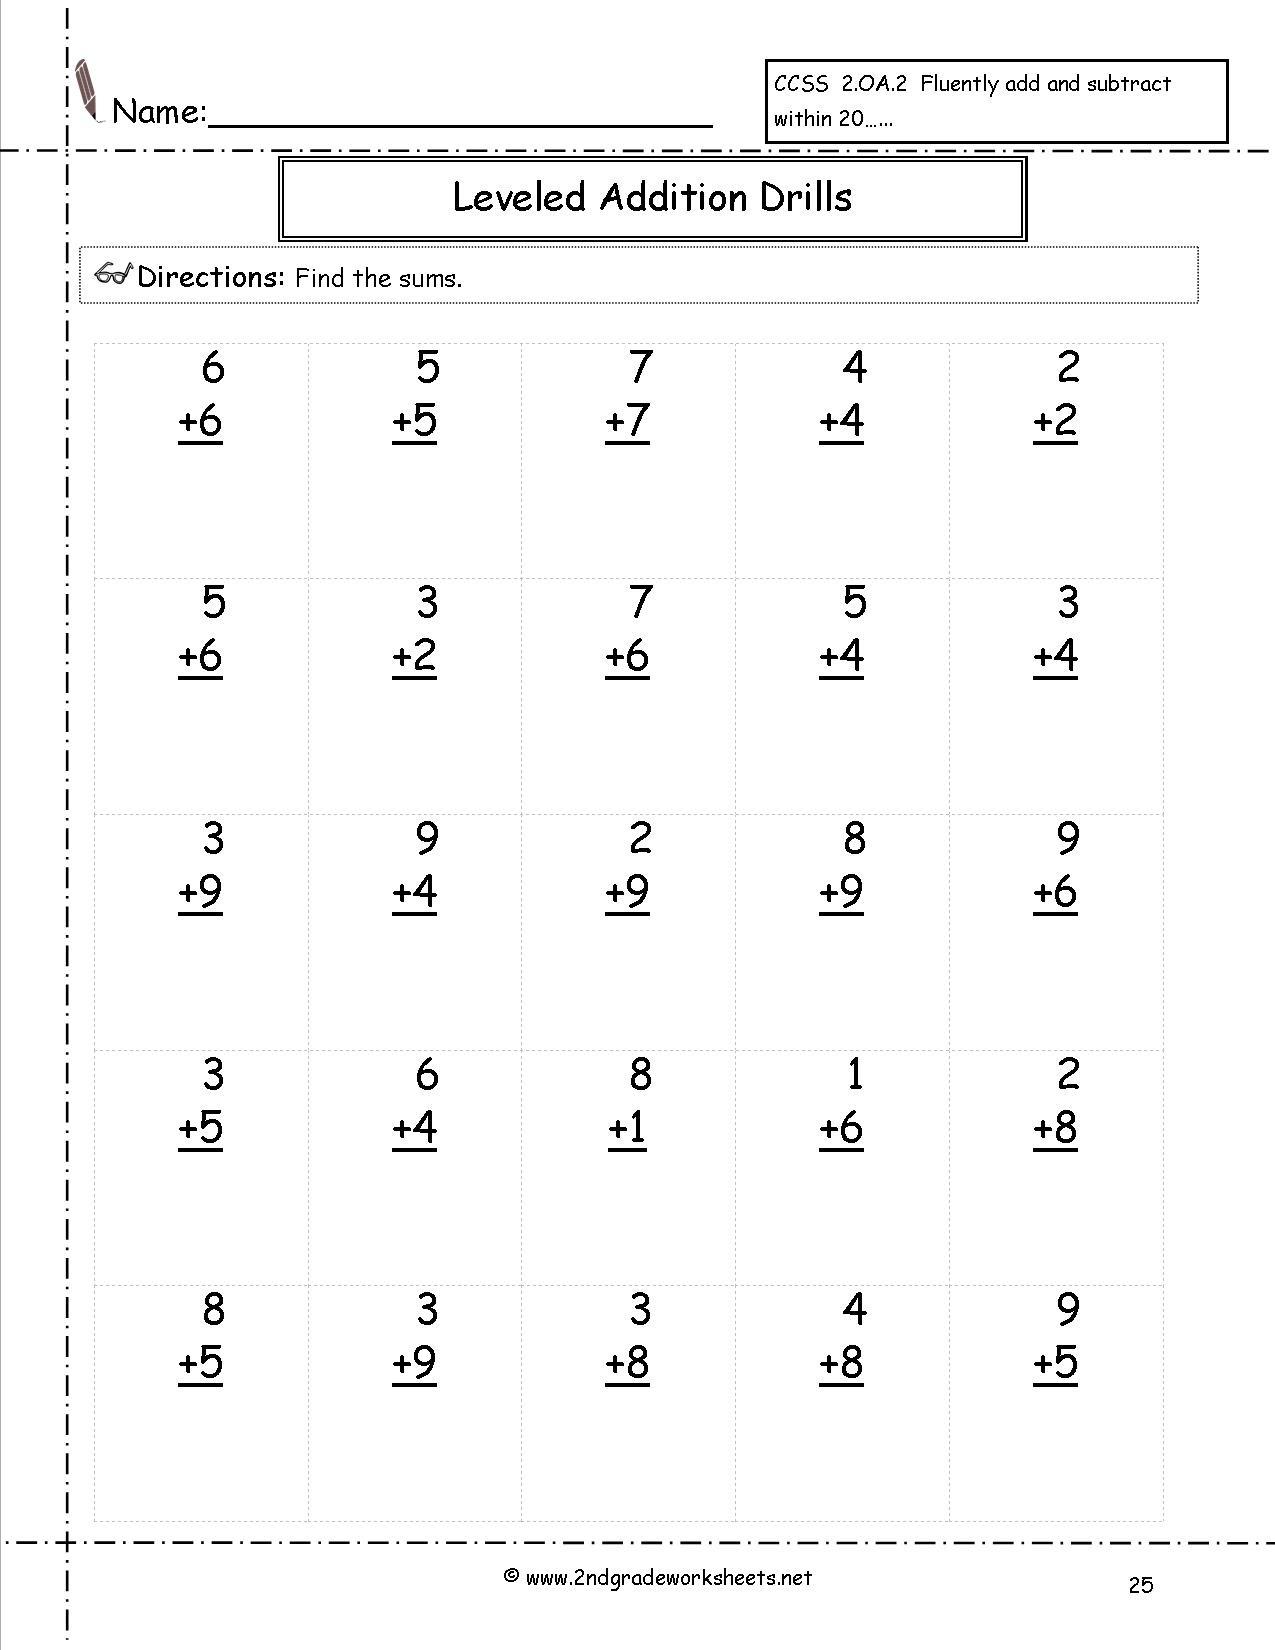 Free Math Worksheets And Printouts - Free Printable Math Worksheets